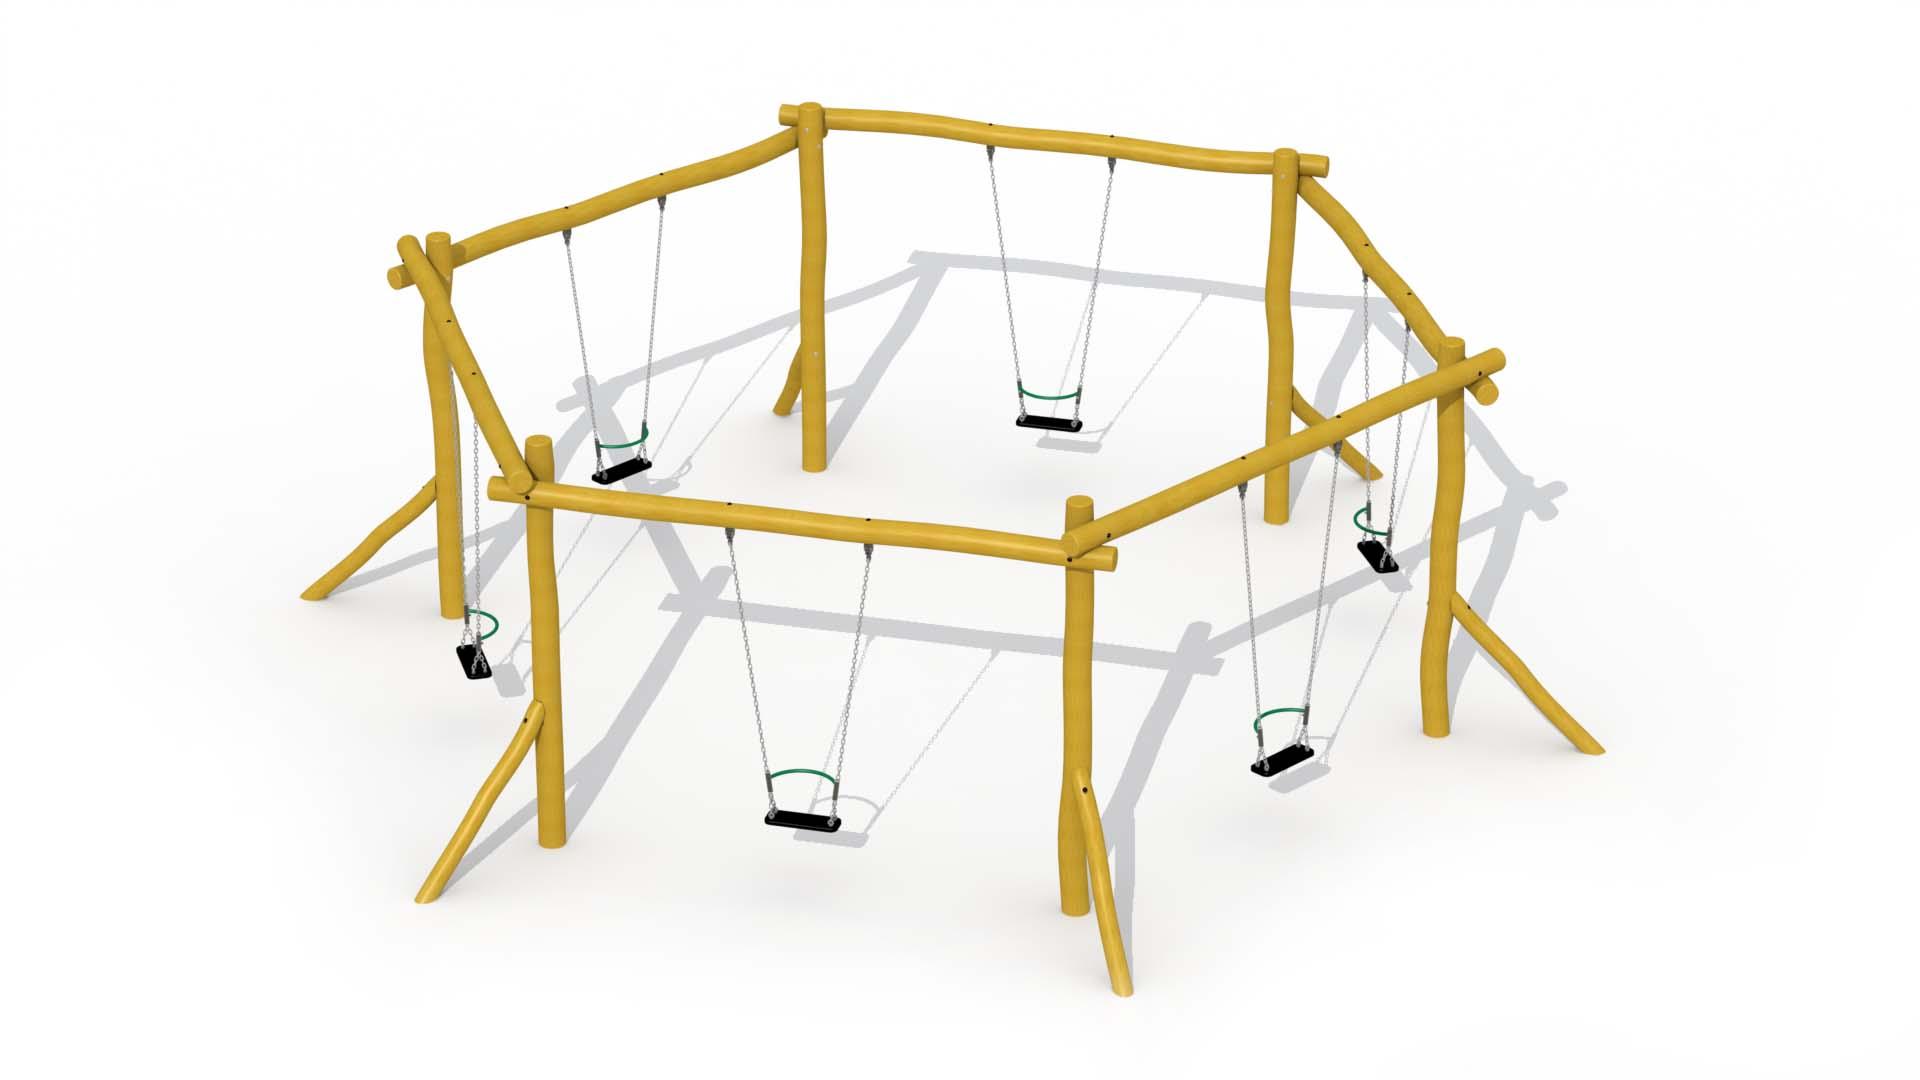 Hexagonal Swing In Robinia (six Rubber Seats With Brace)